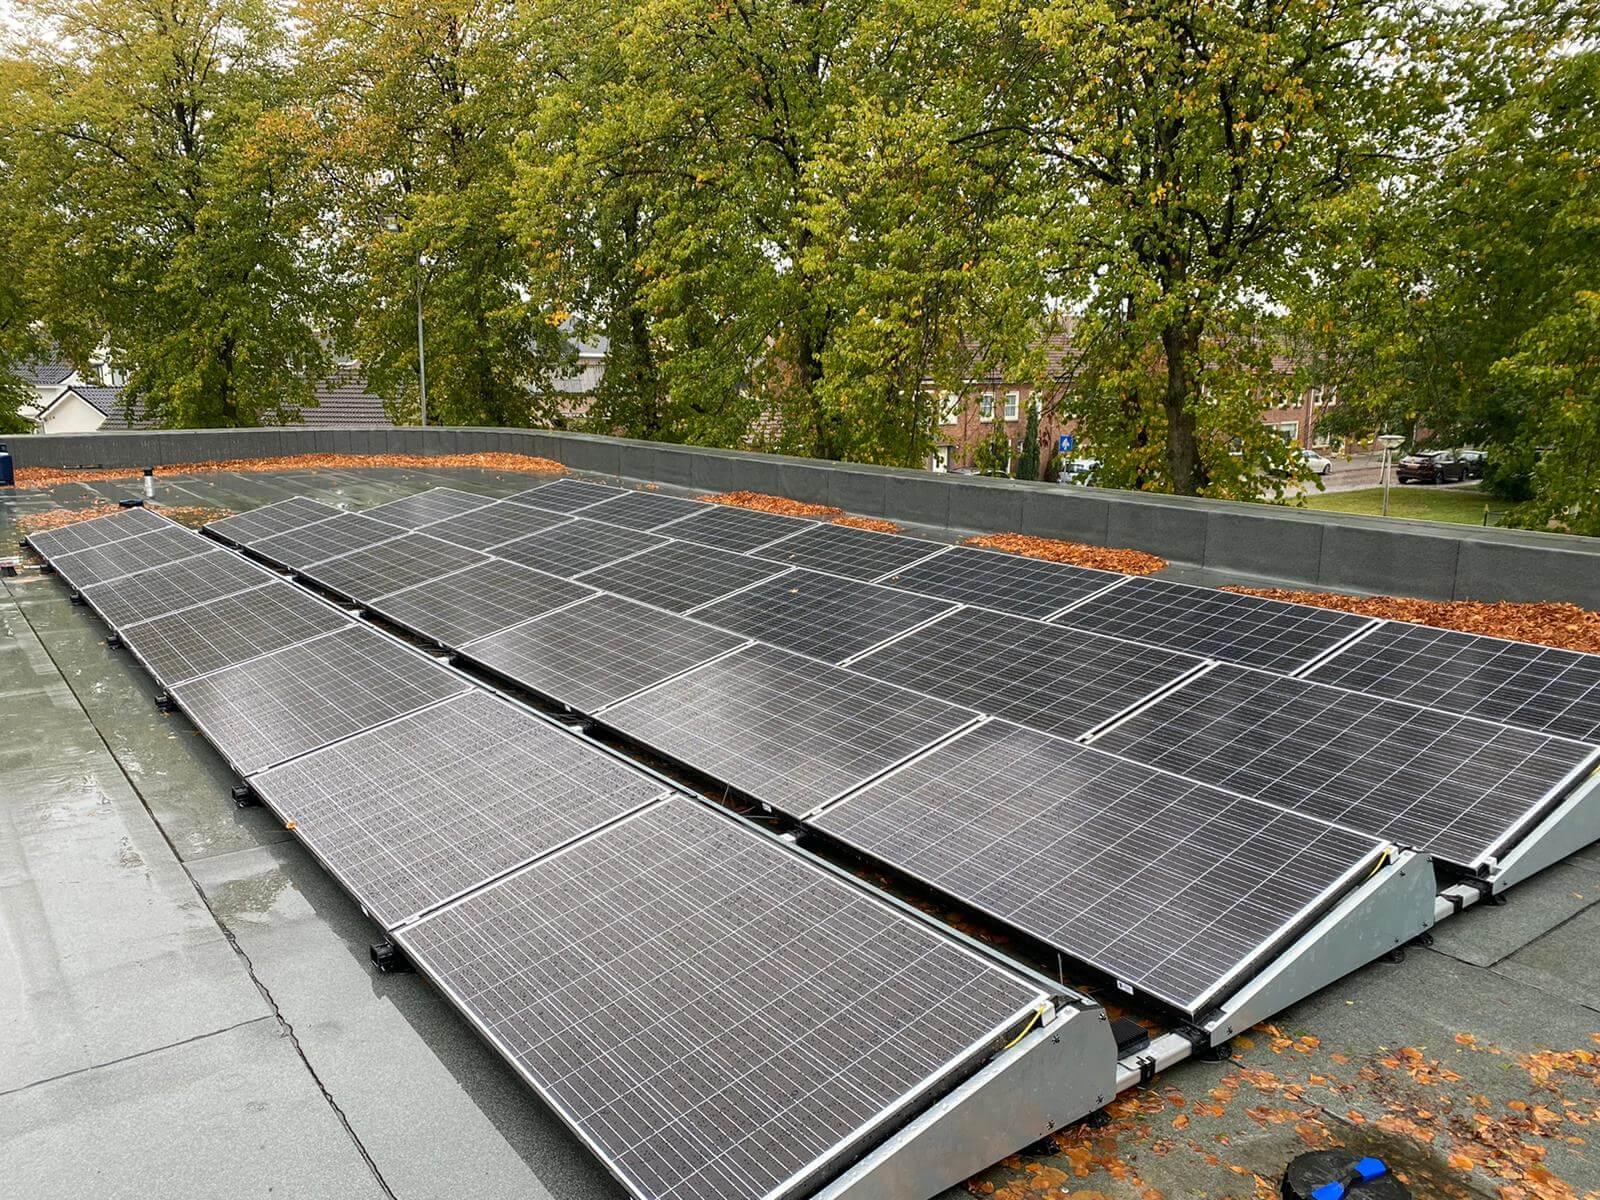 Installatie zonnepanelen bij MC Etten-Leur